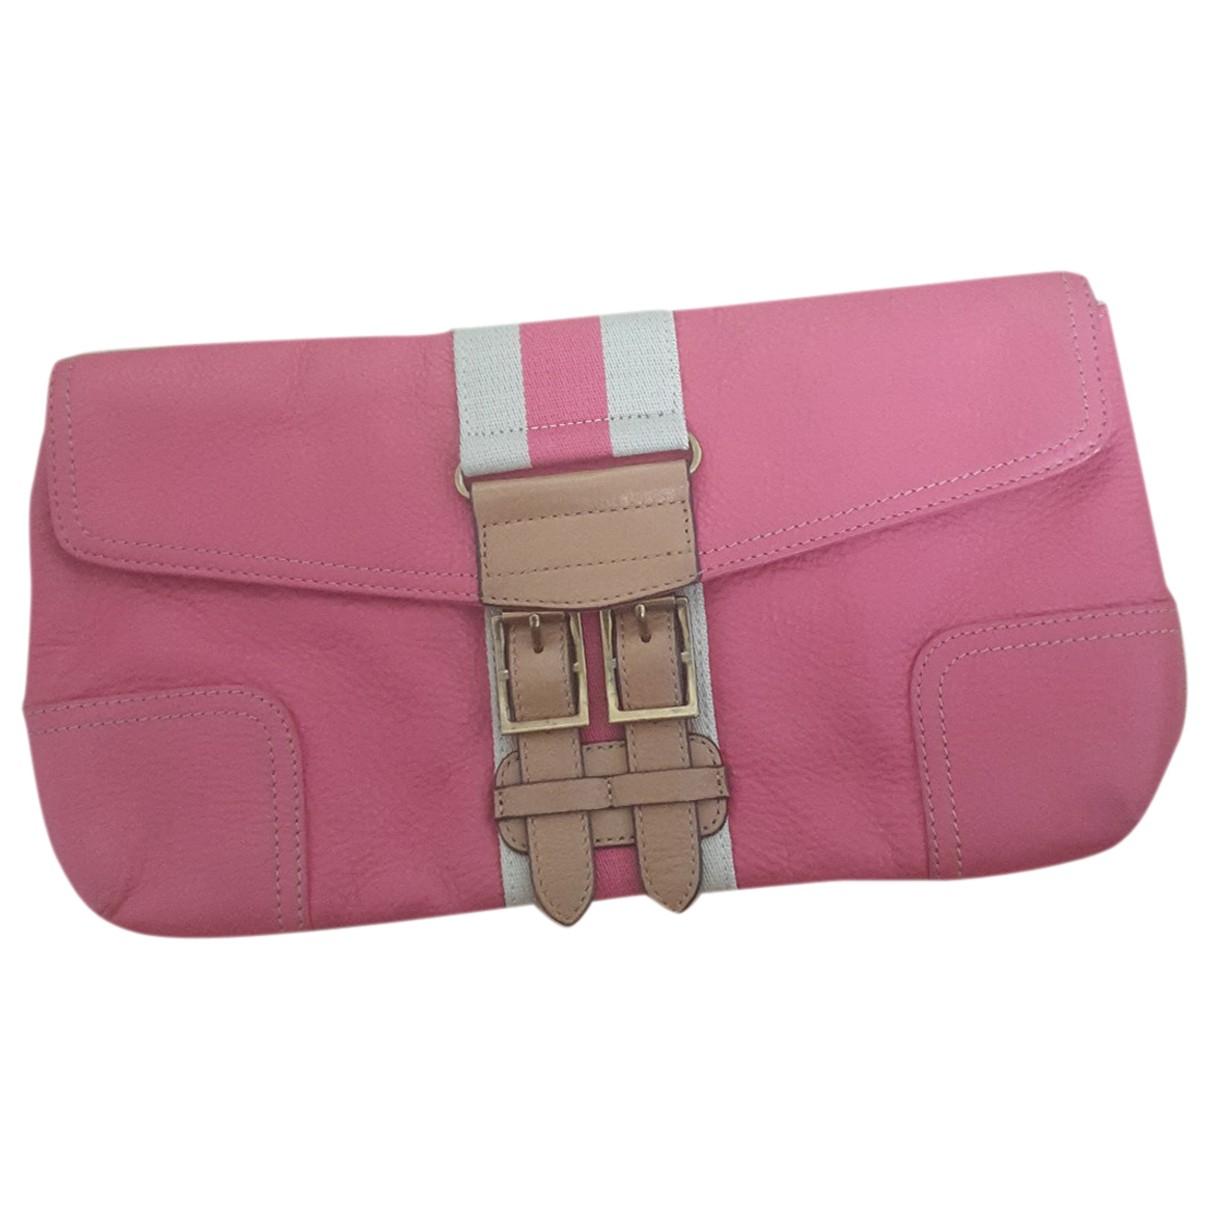 Tommy Hilfiger N Leather Clutch bag for Women N